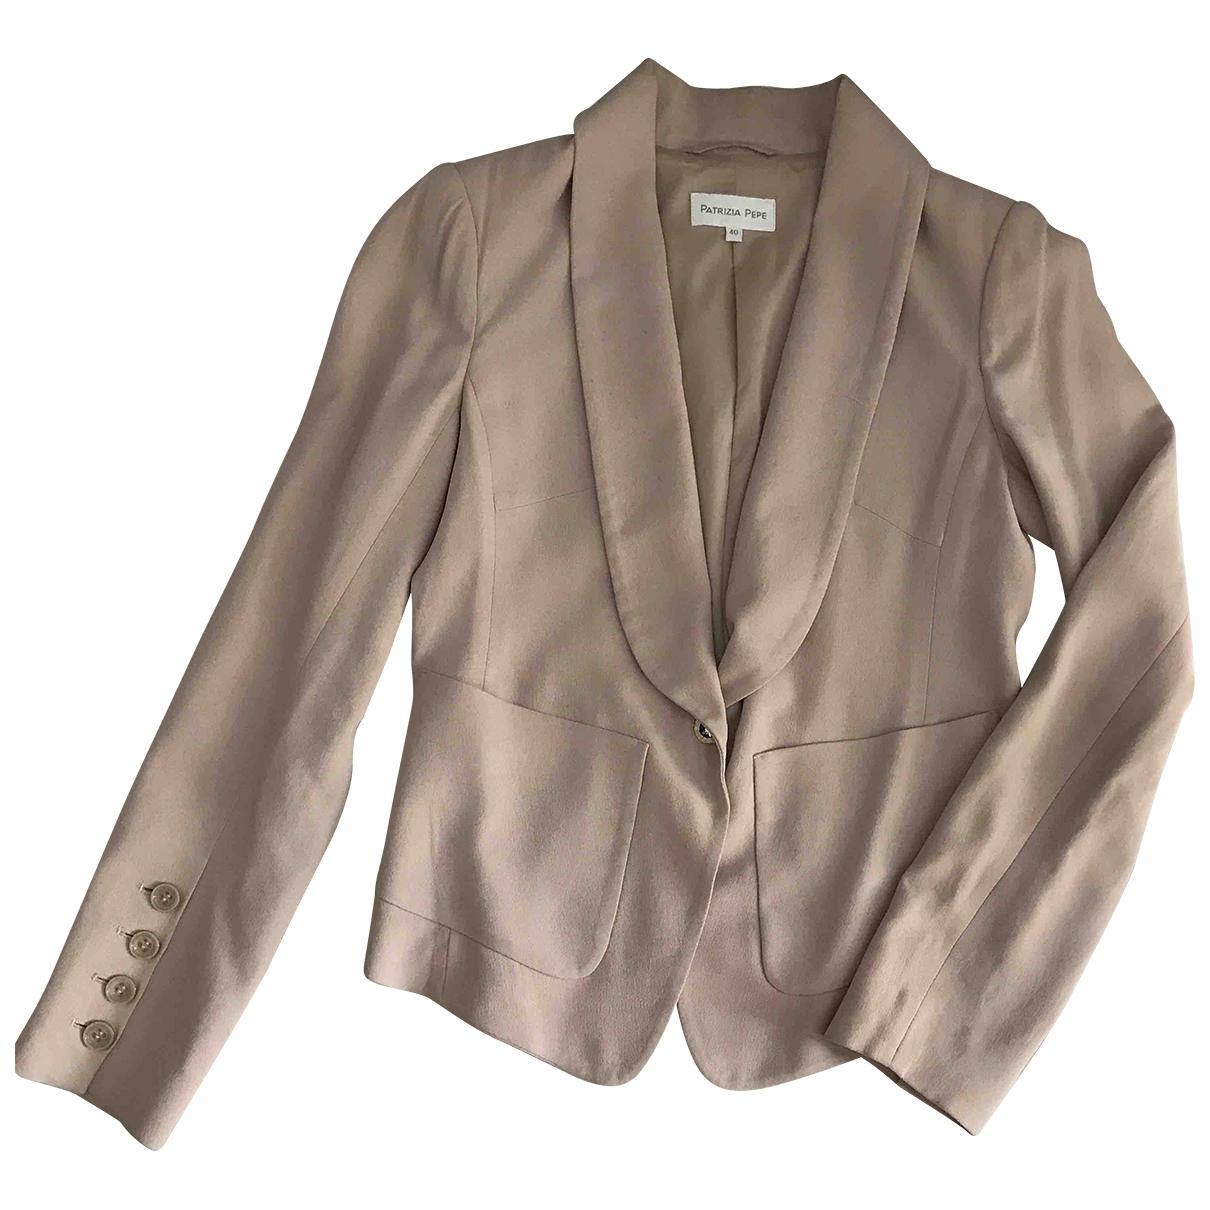 Patrizia Pepe \N Pink jacket for Women 40 IT